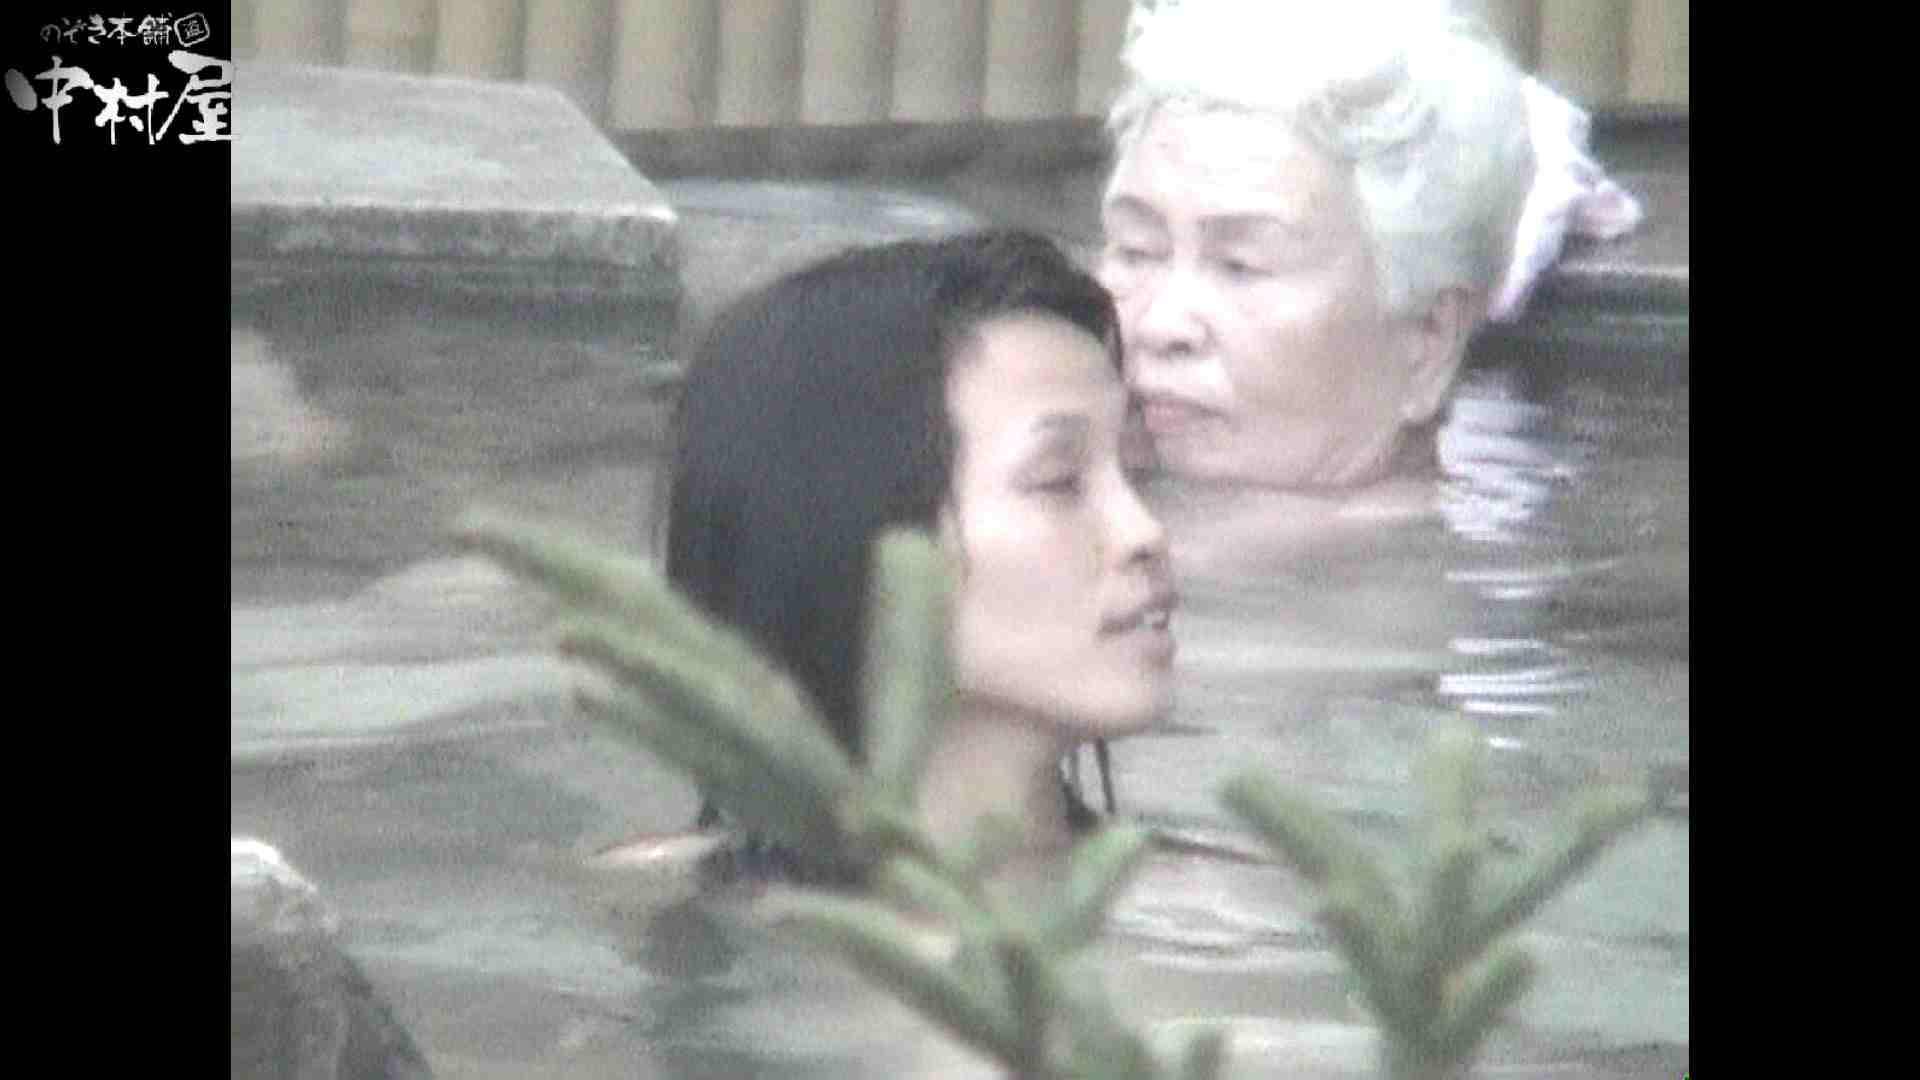 Aquaな露天風呂Vol.933 盗撮 おまんこ動画流出 78PICs 56